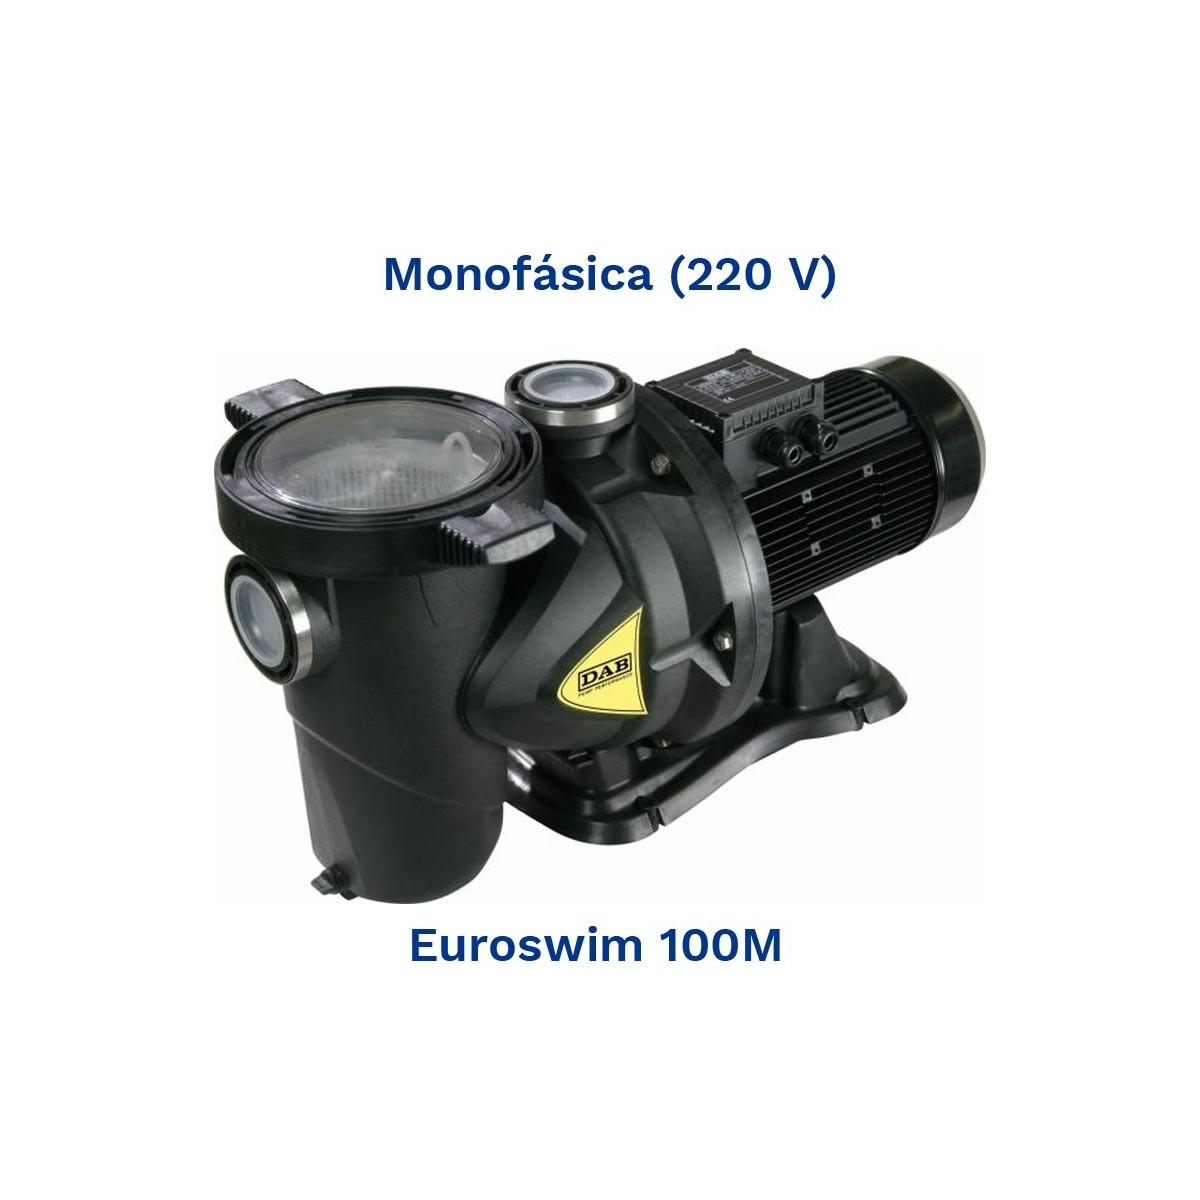 Dab bomba piscinas euroswim 100m (0